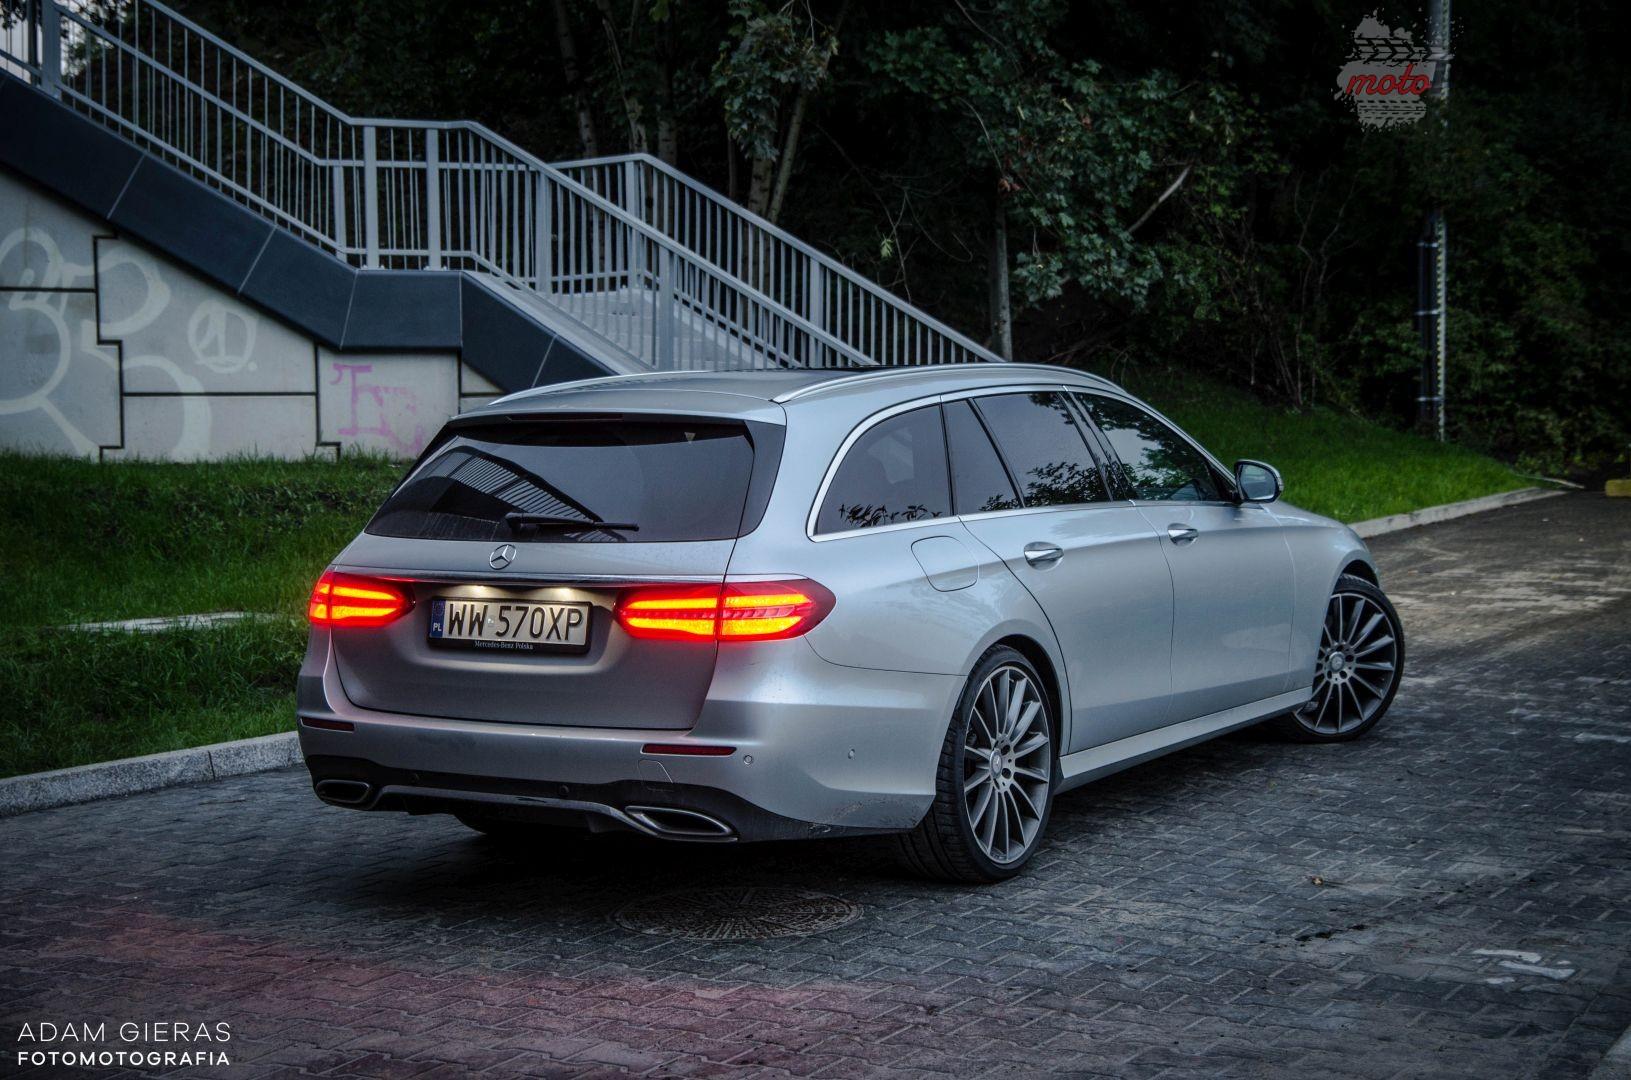 E klasa 21 Test: Mercedes E 220d Kombi   zamiast SUV a?